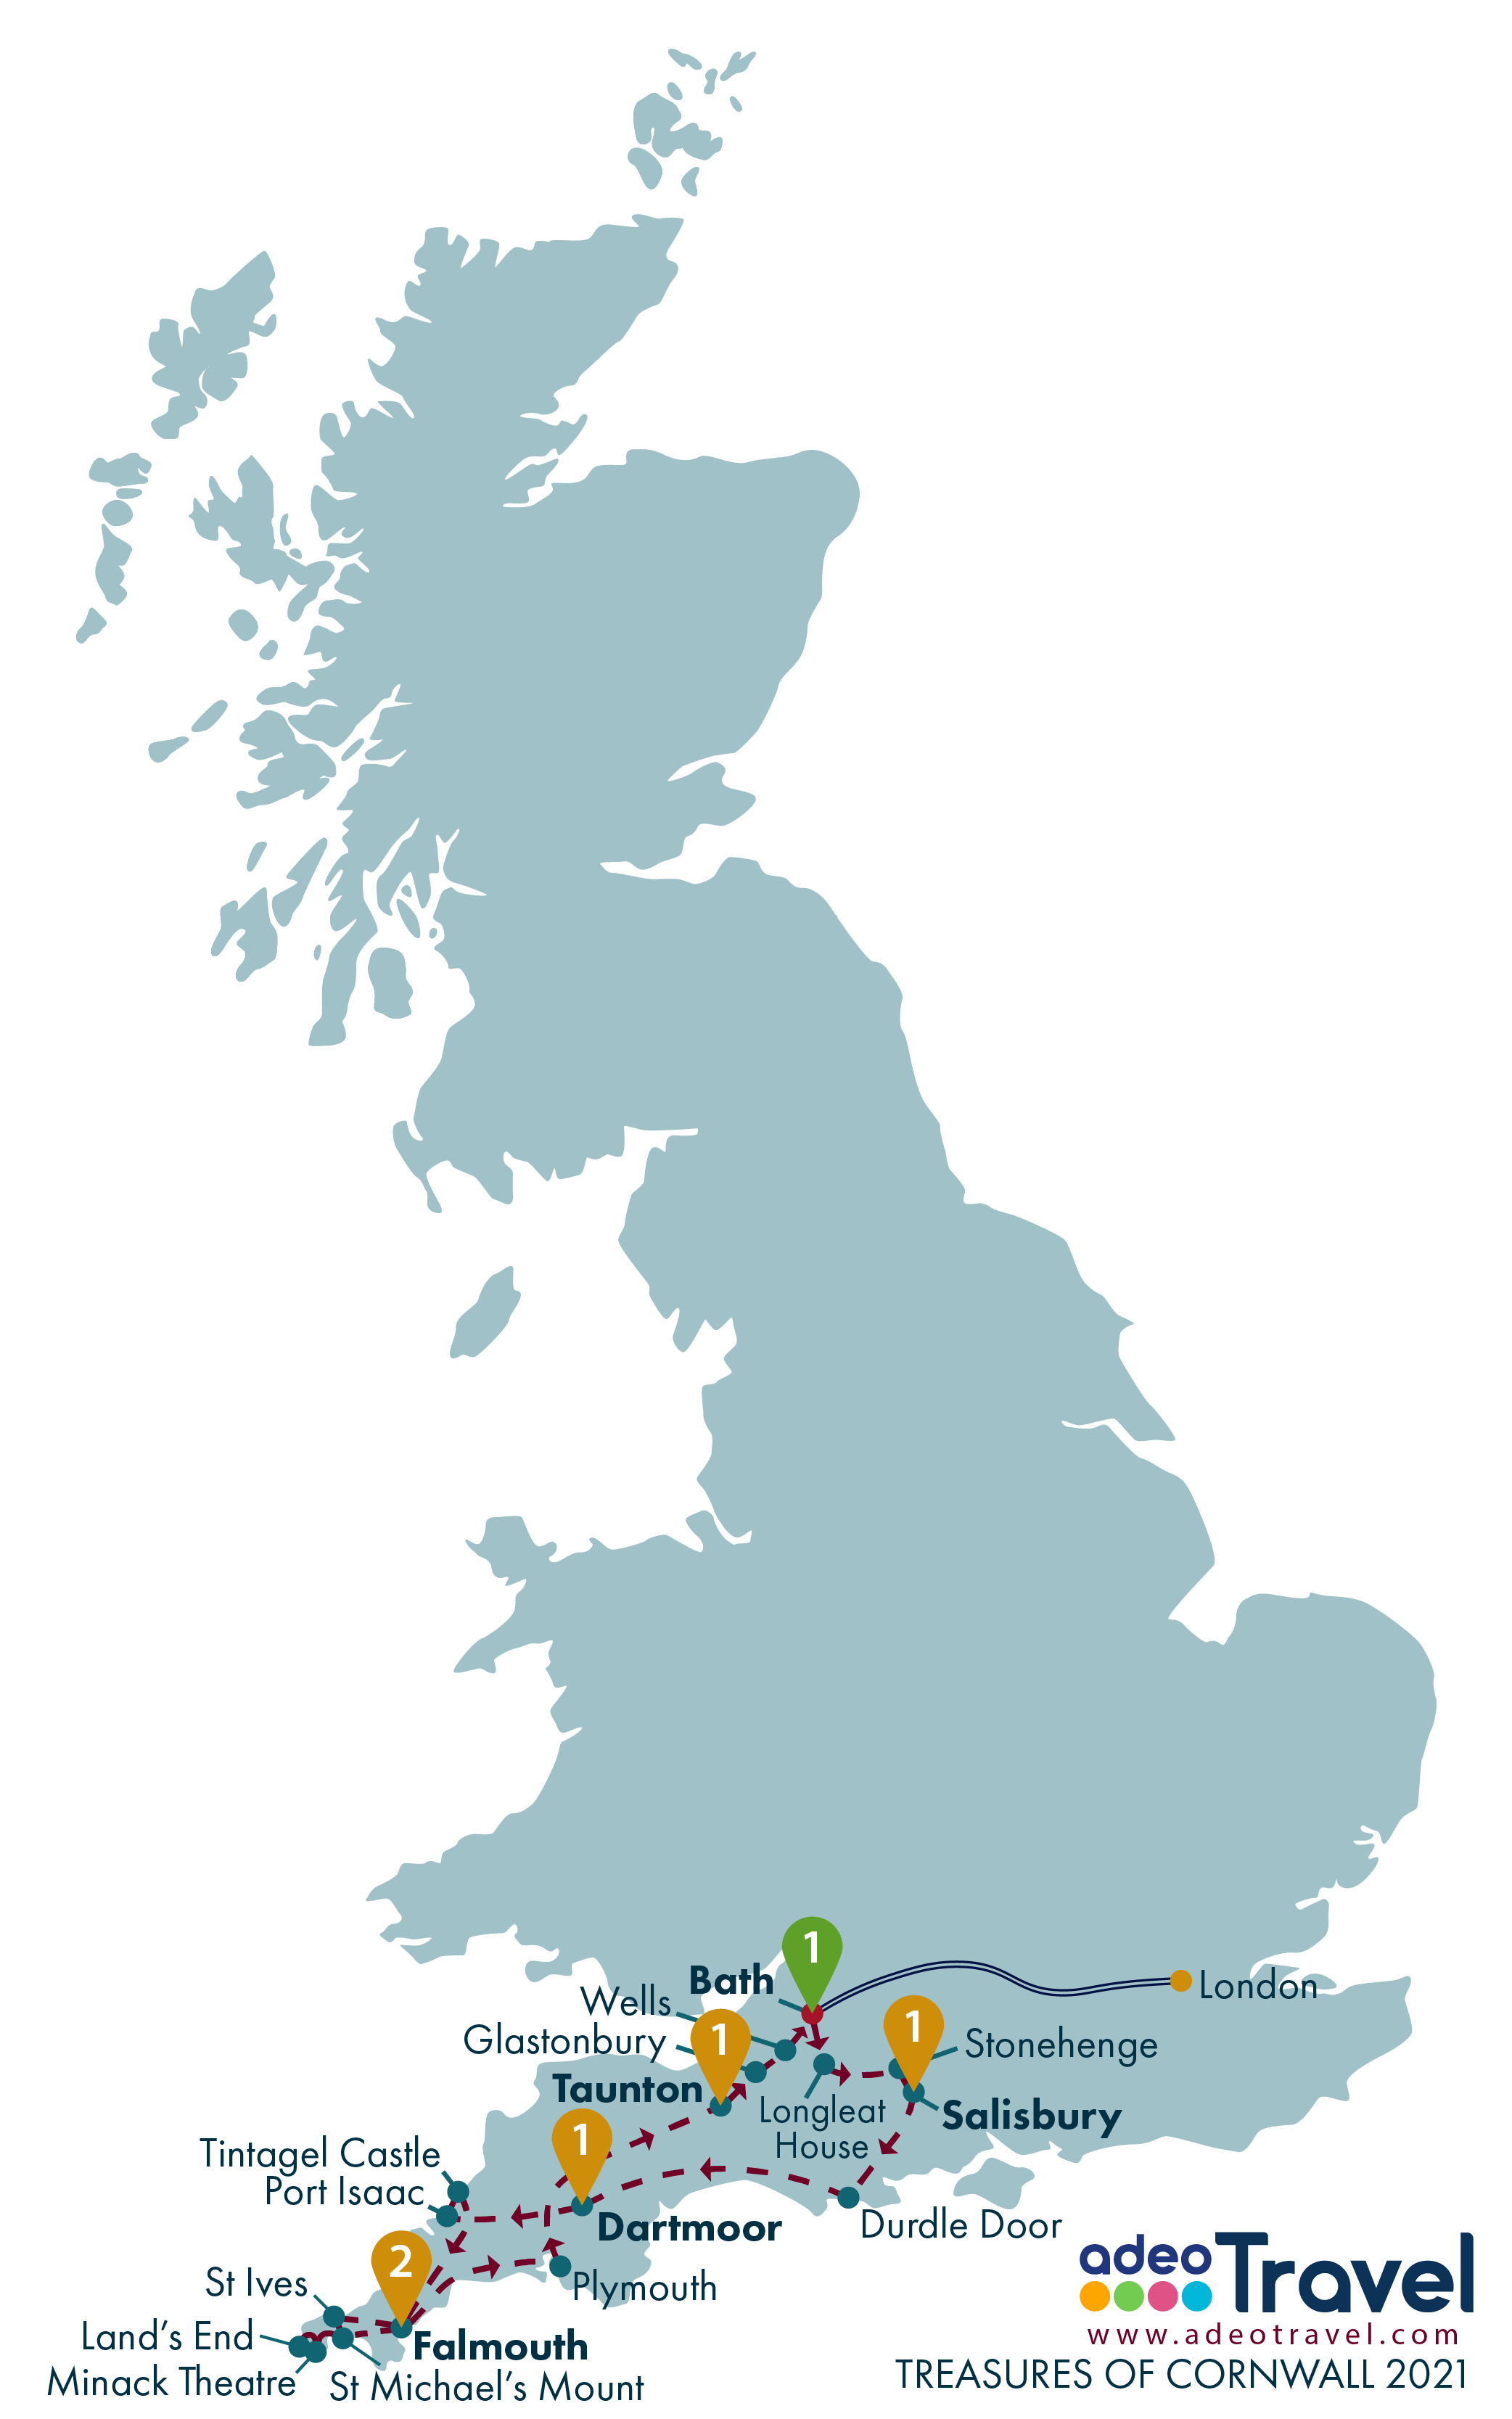 Map - Treasures of Cornwall 2021